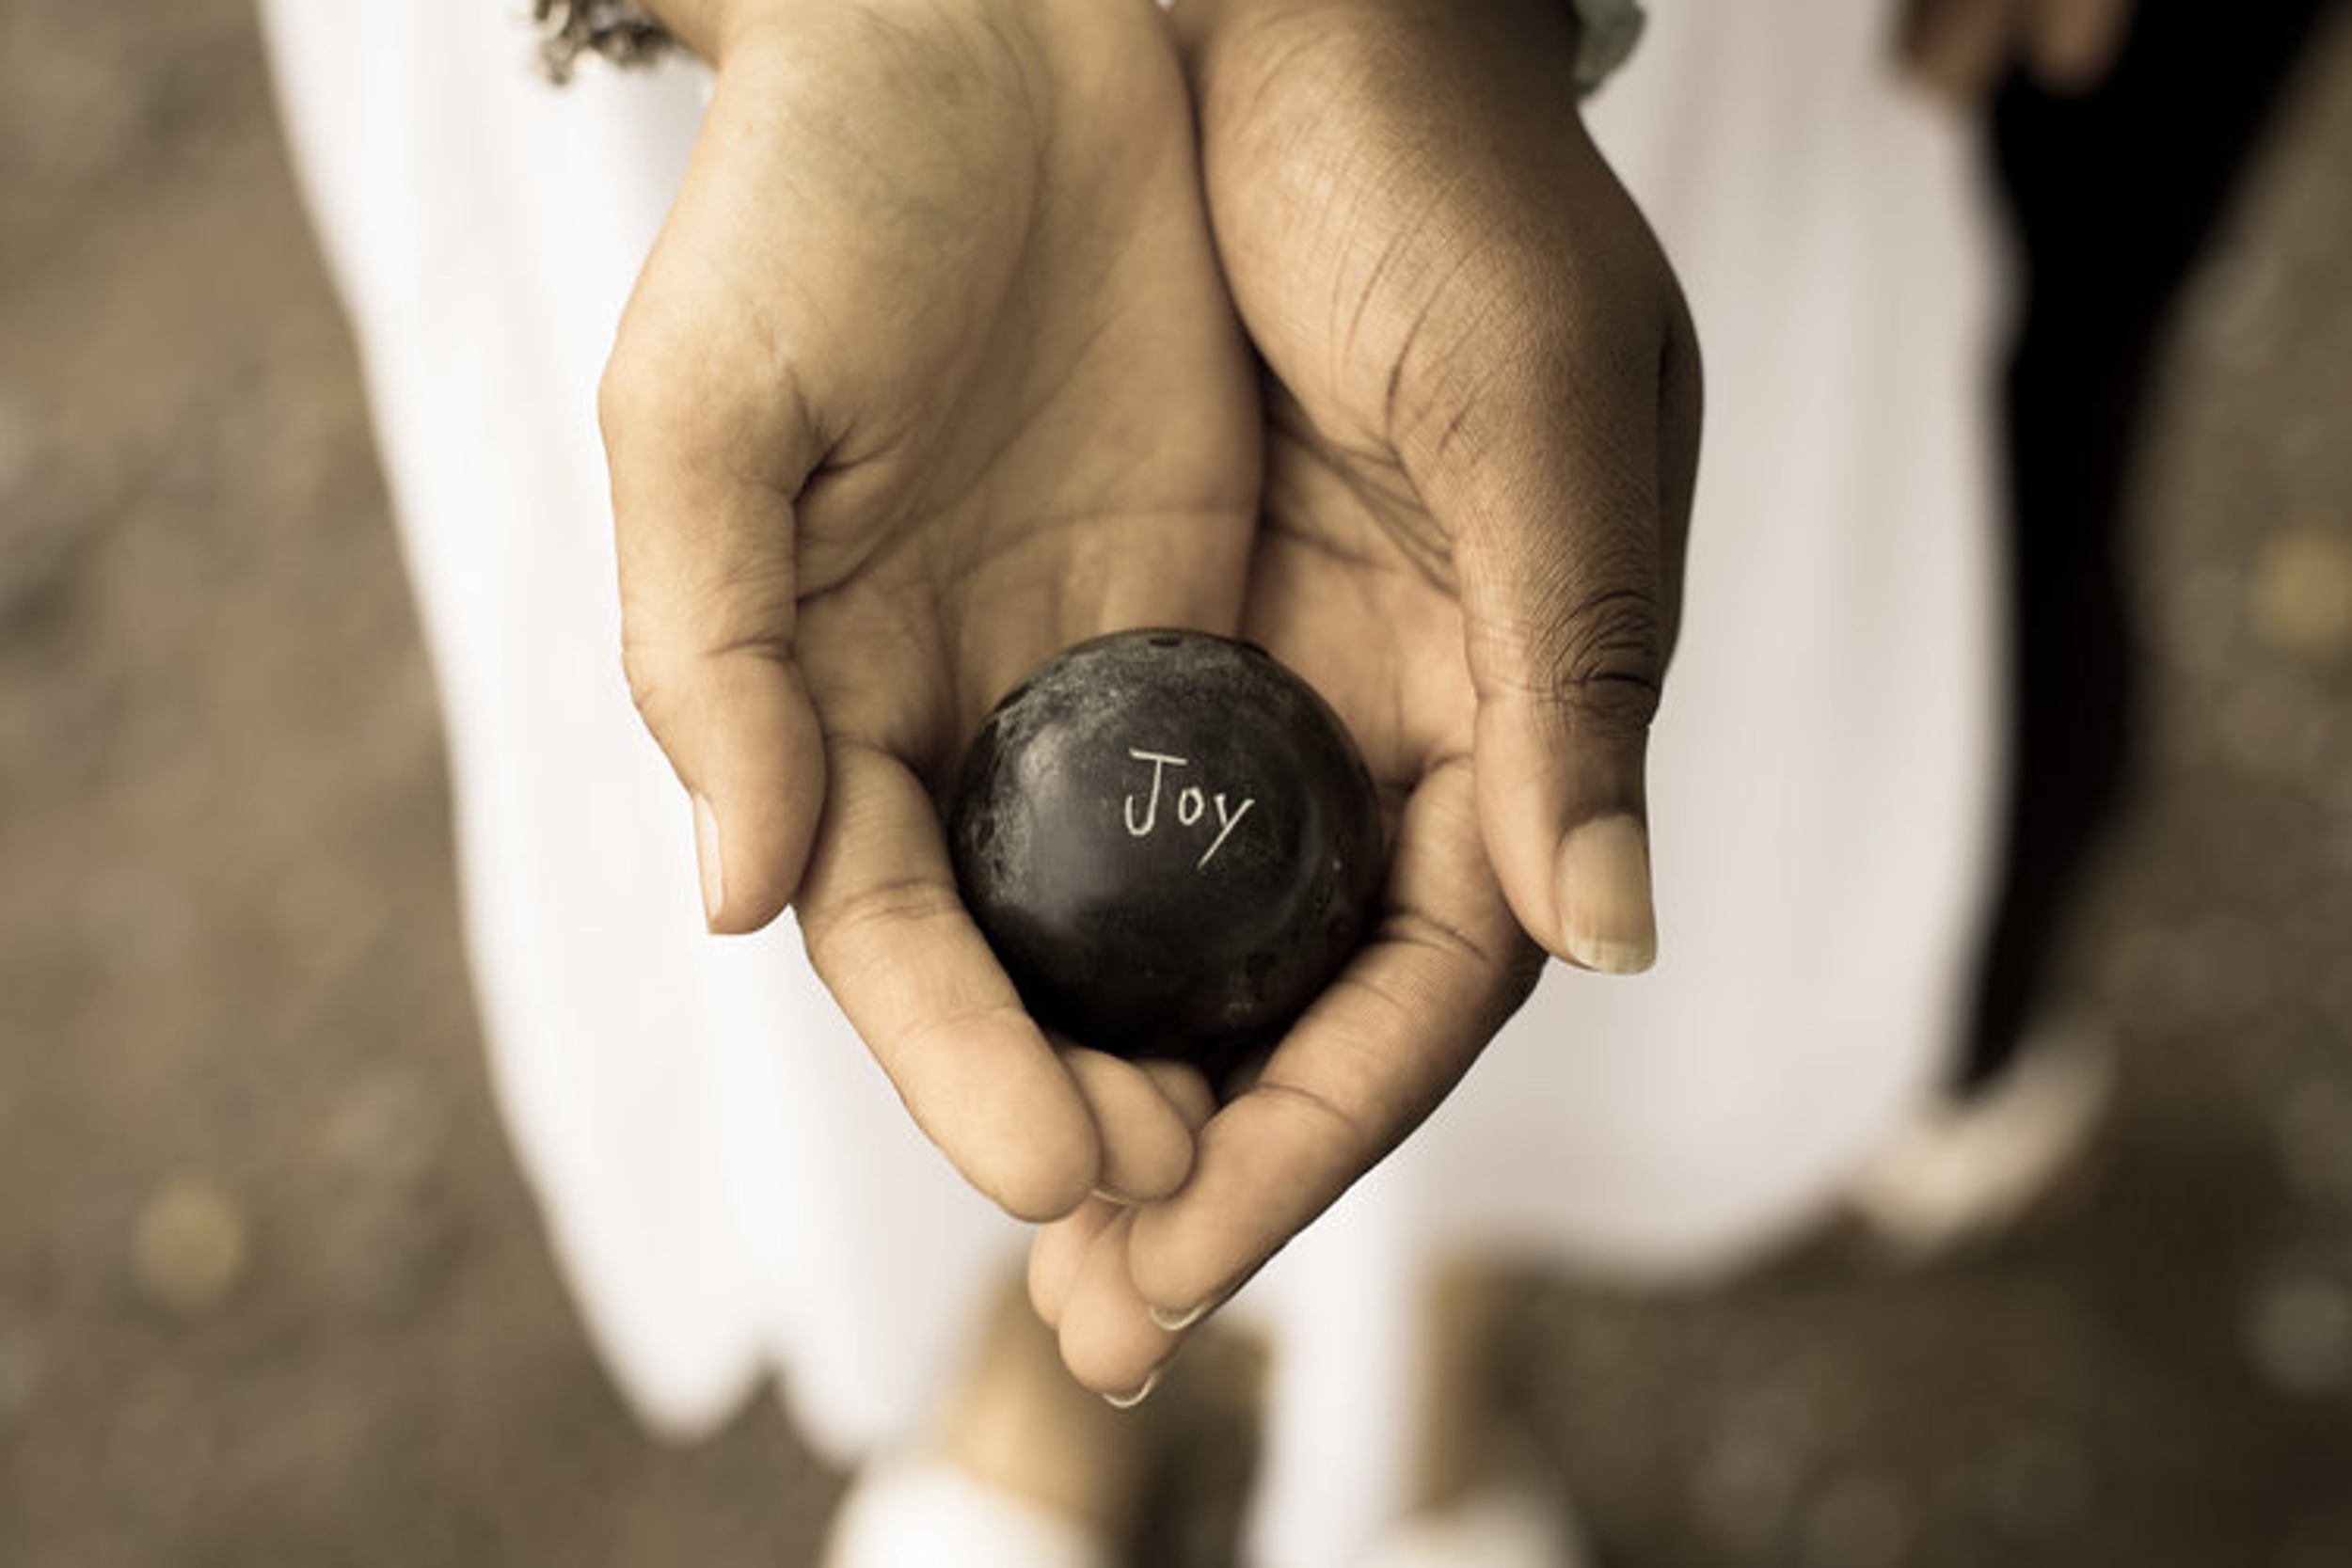 joy hand.png